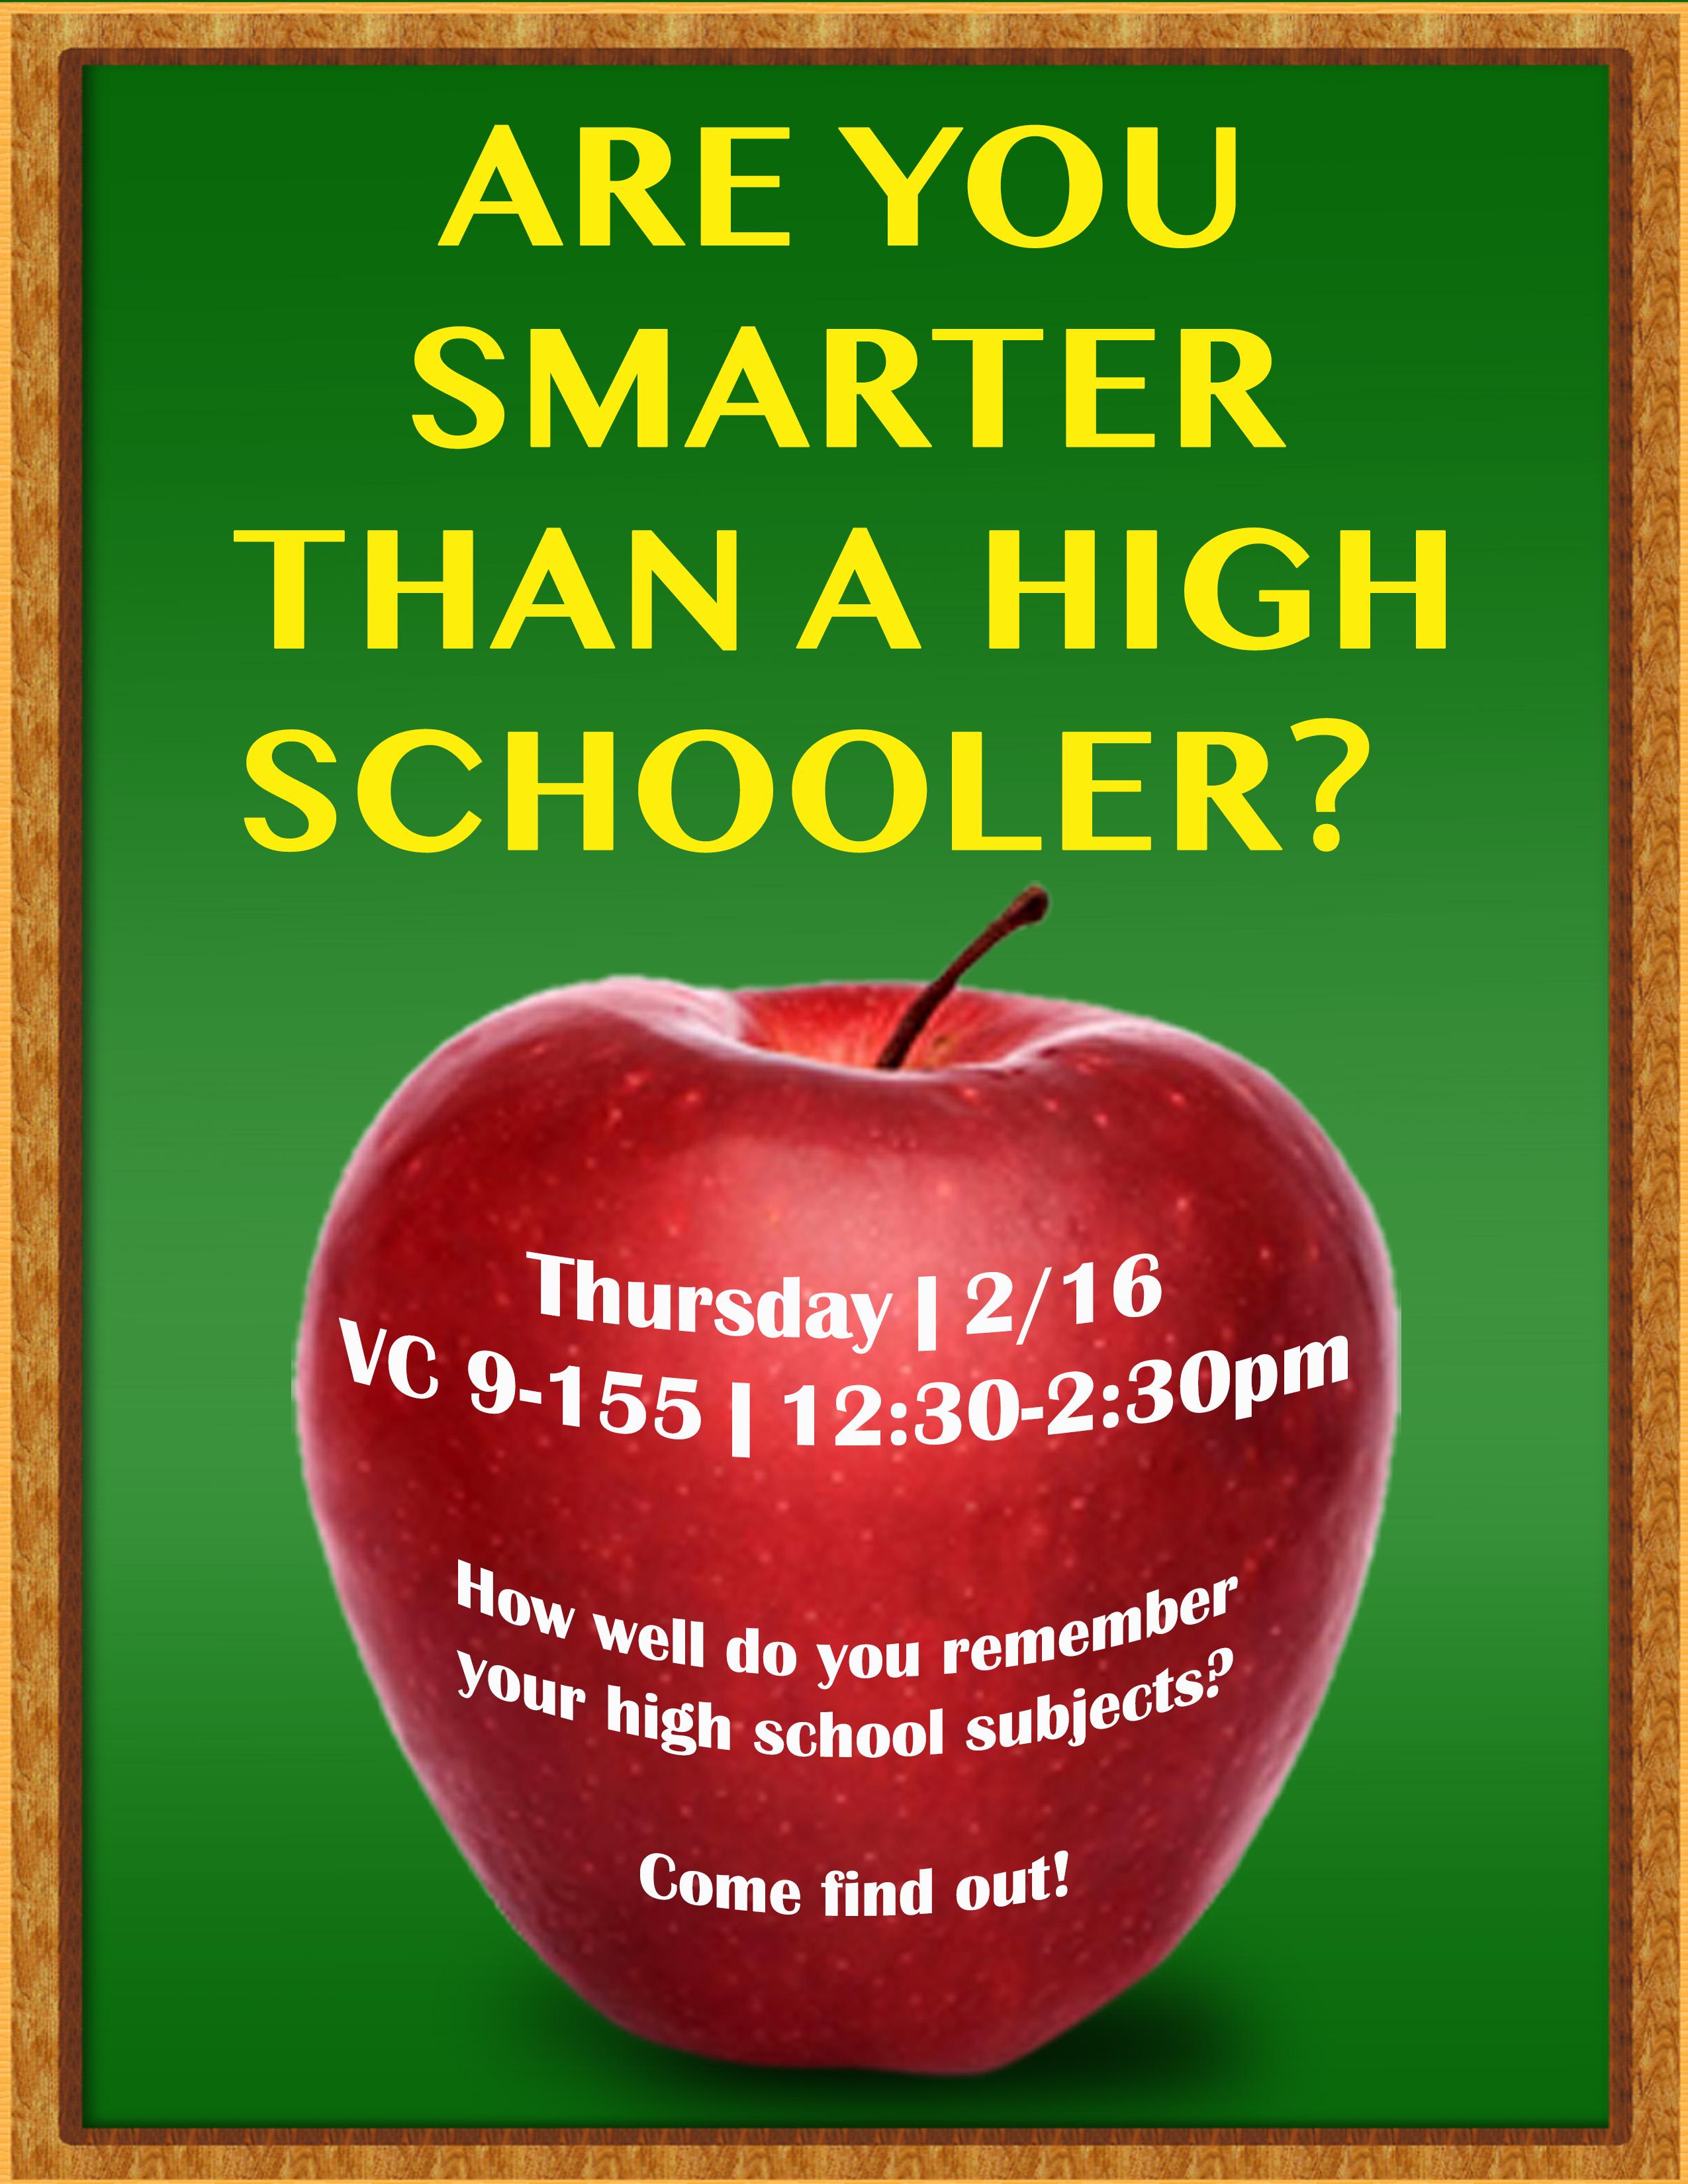 Are you smarter than a high schooler